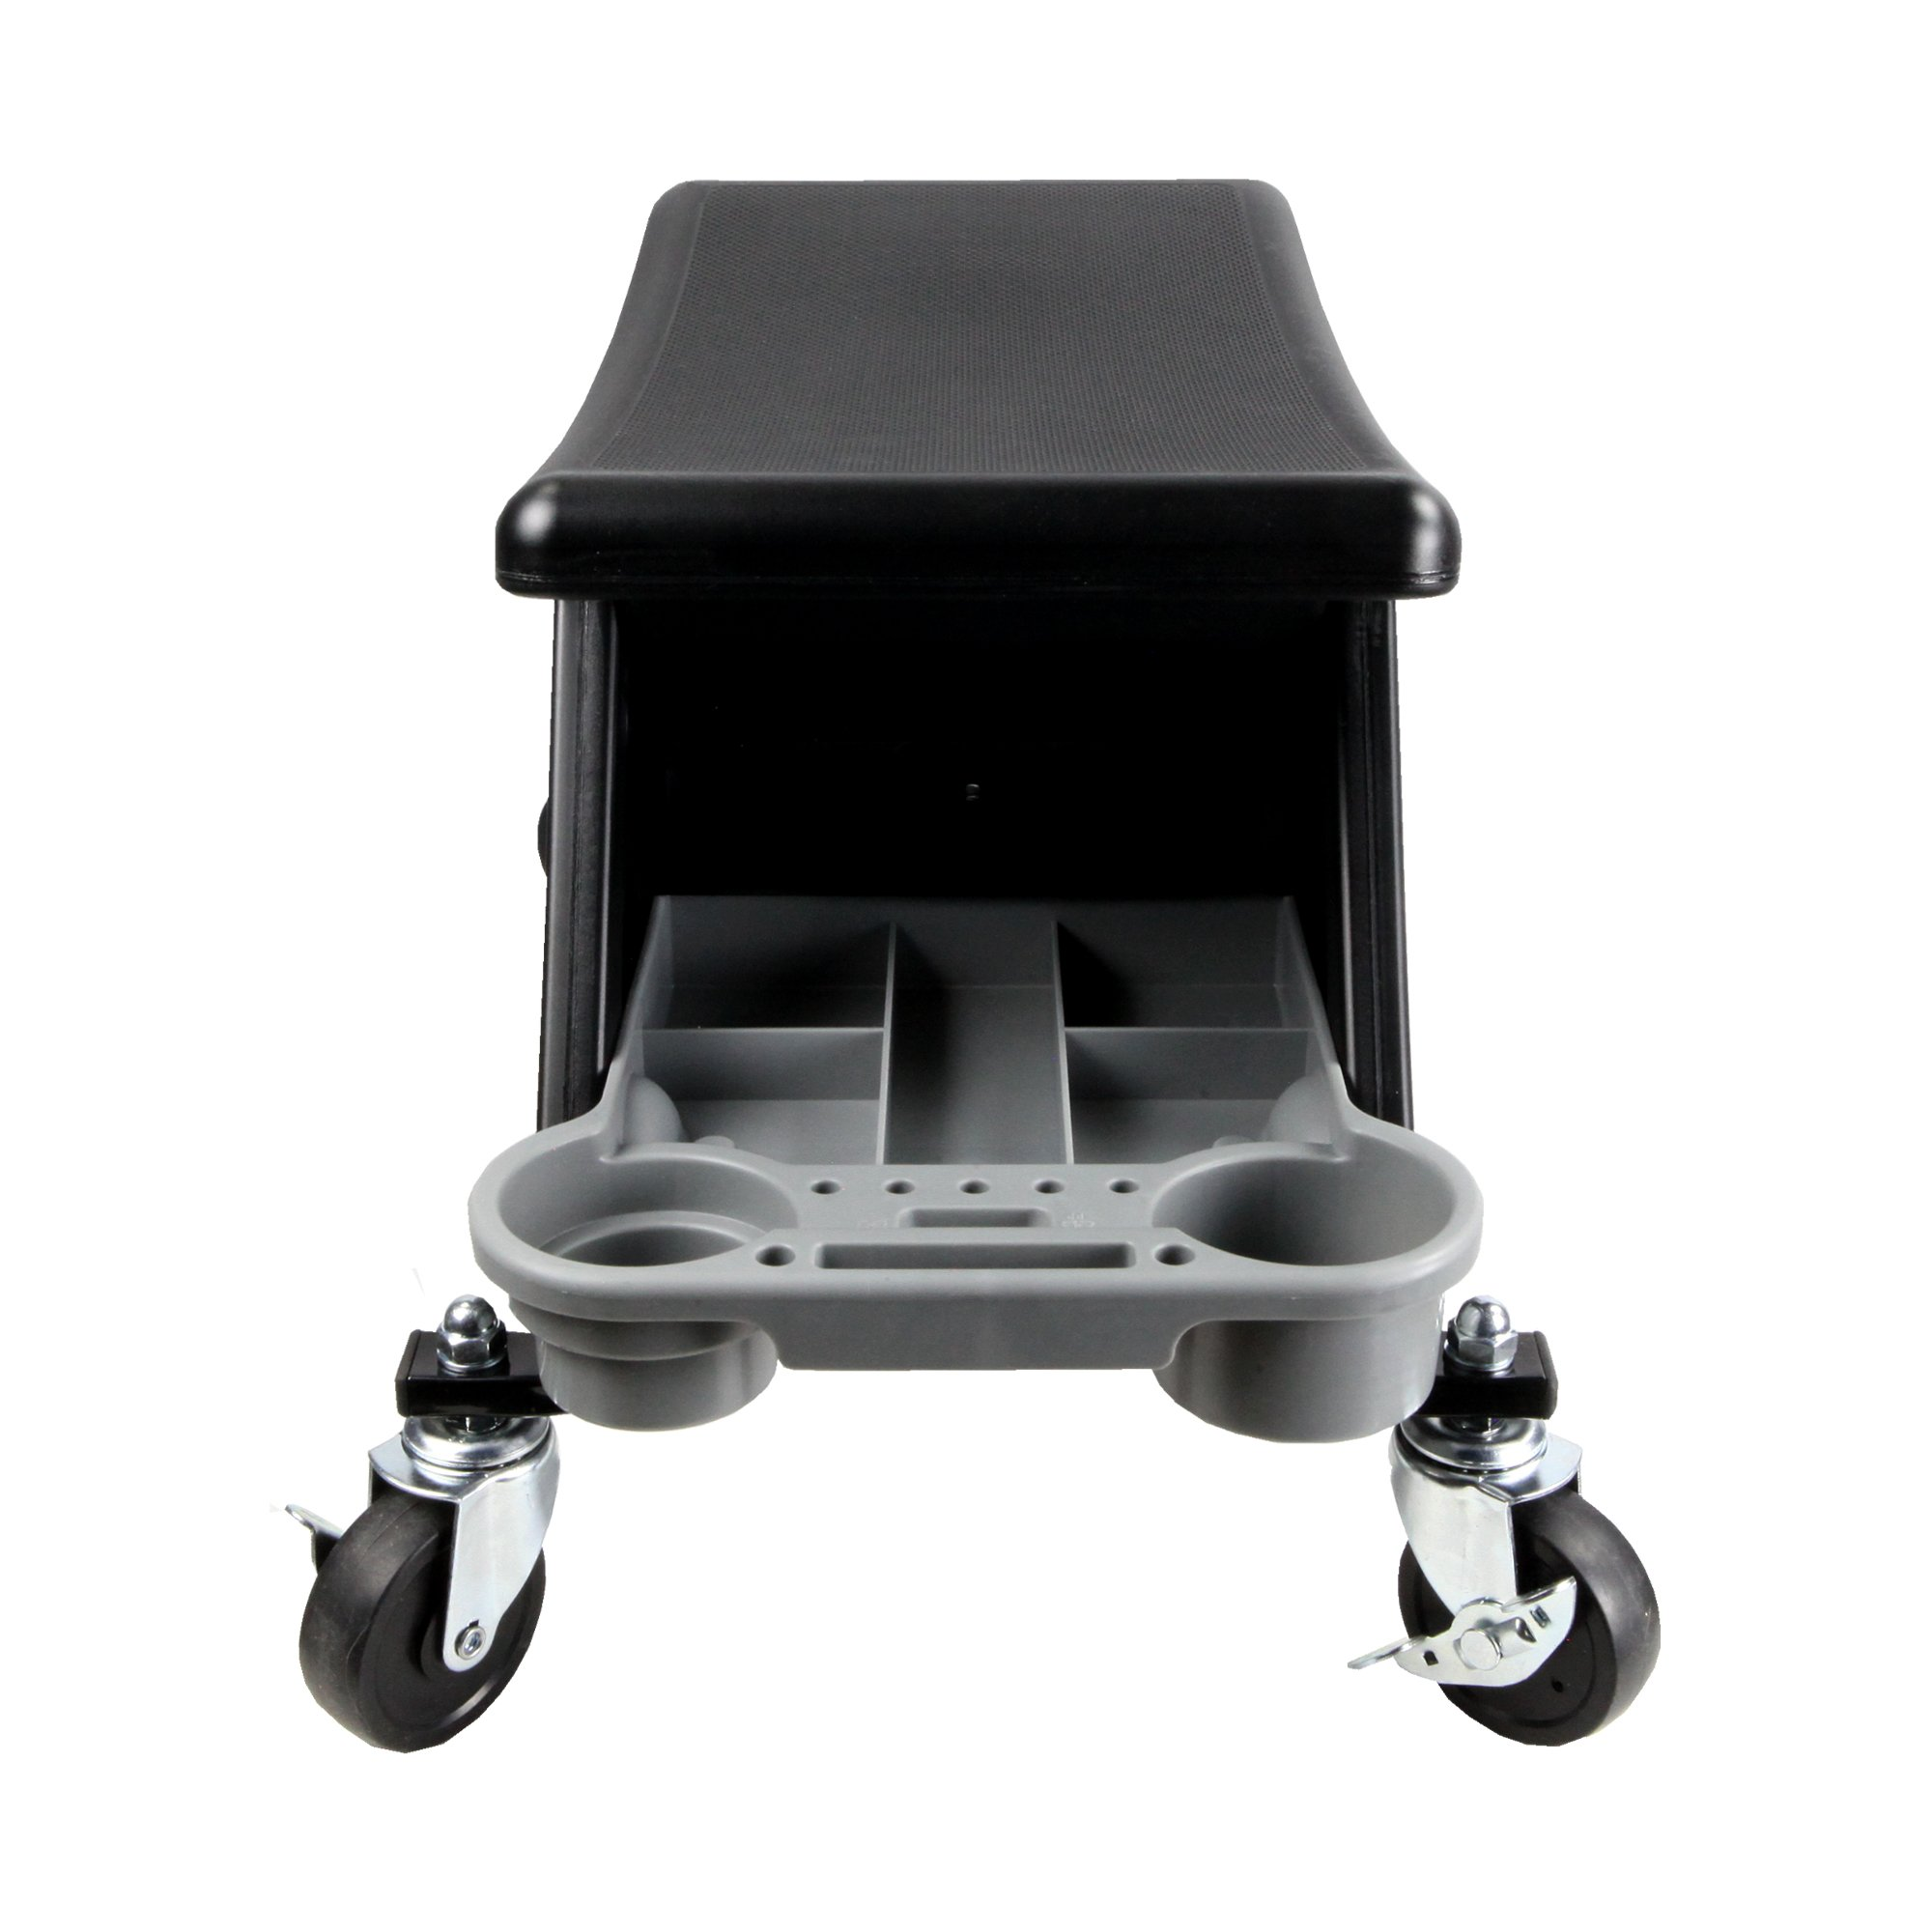 Boomerang ToolStool Roller-Seat Shop-Cart by Boomerang (Image #3)